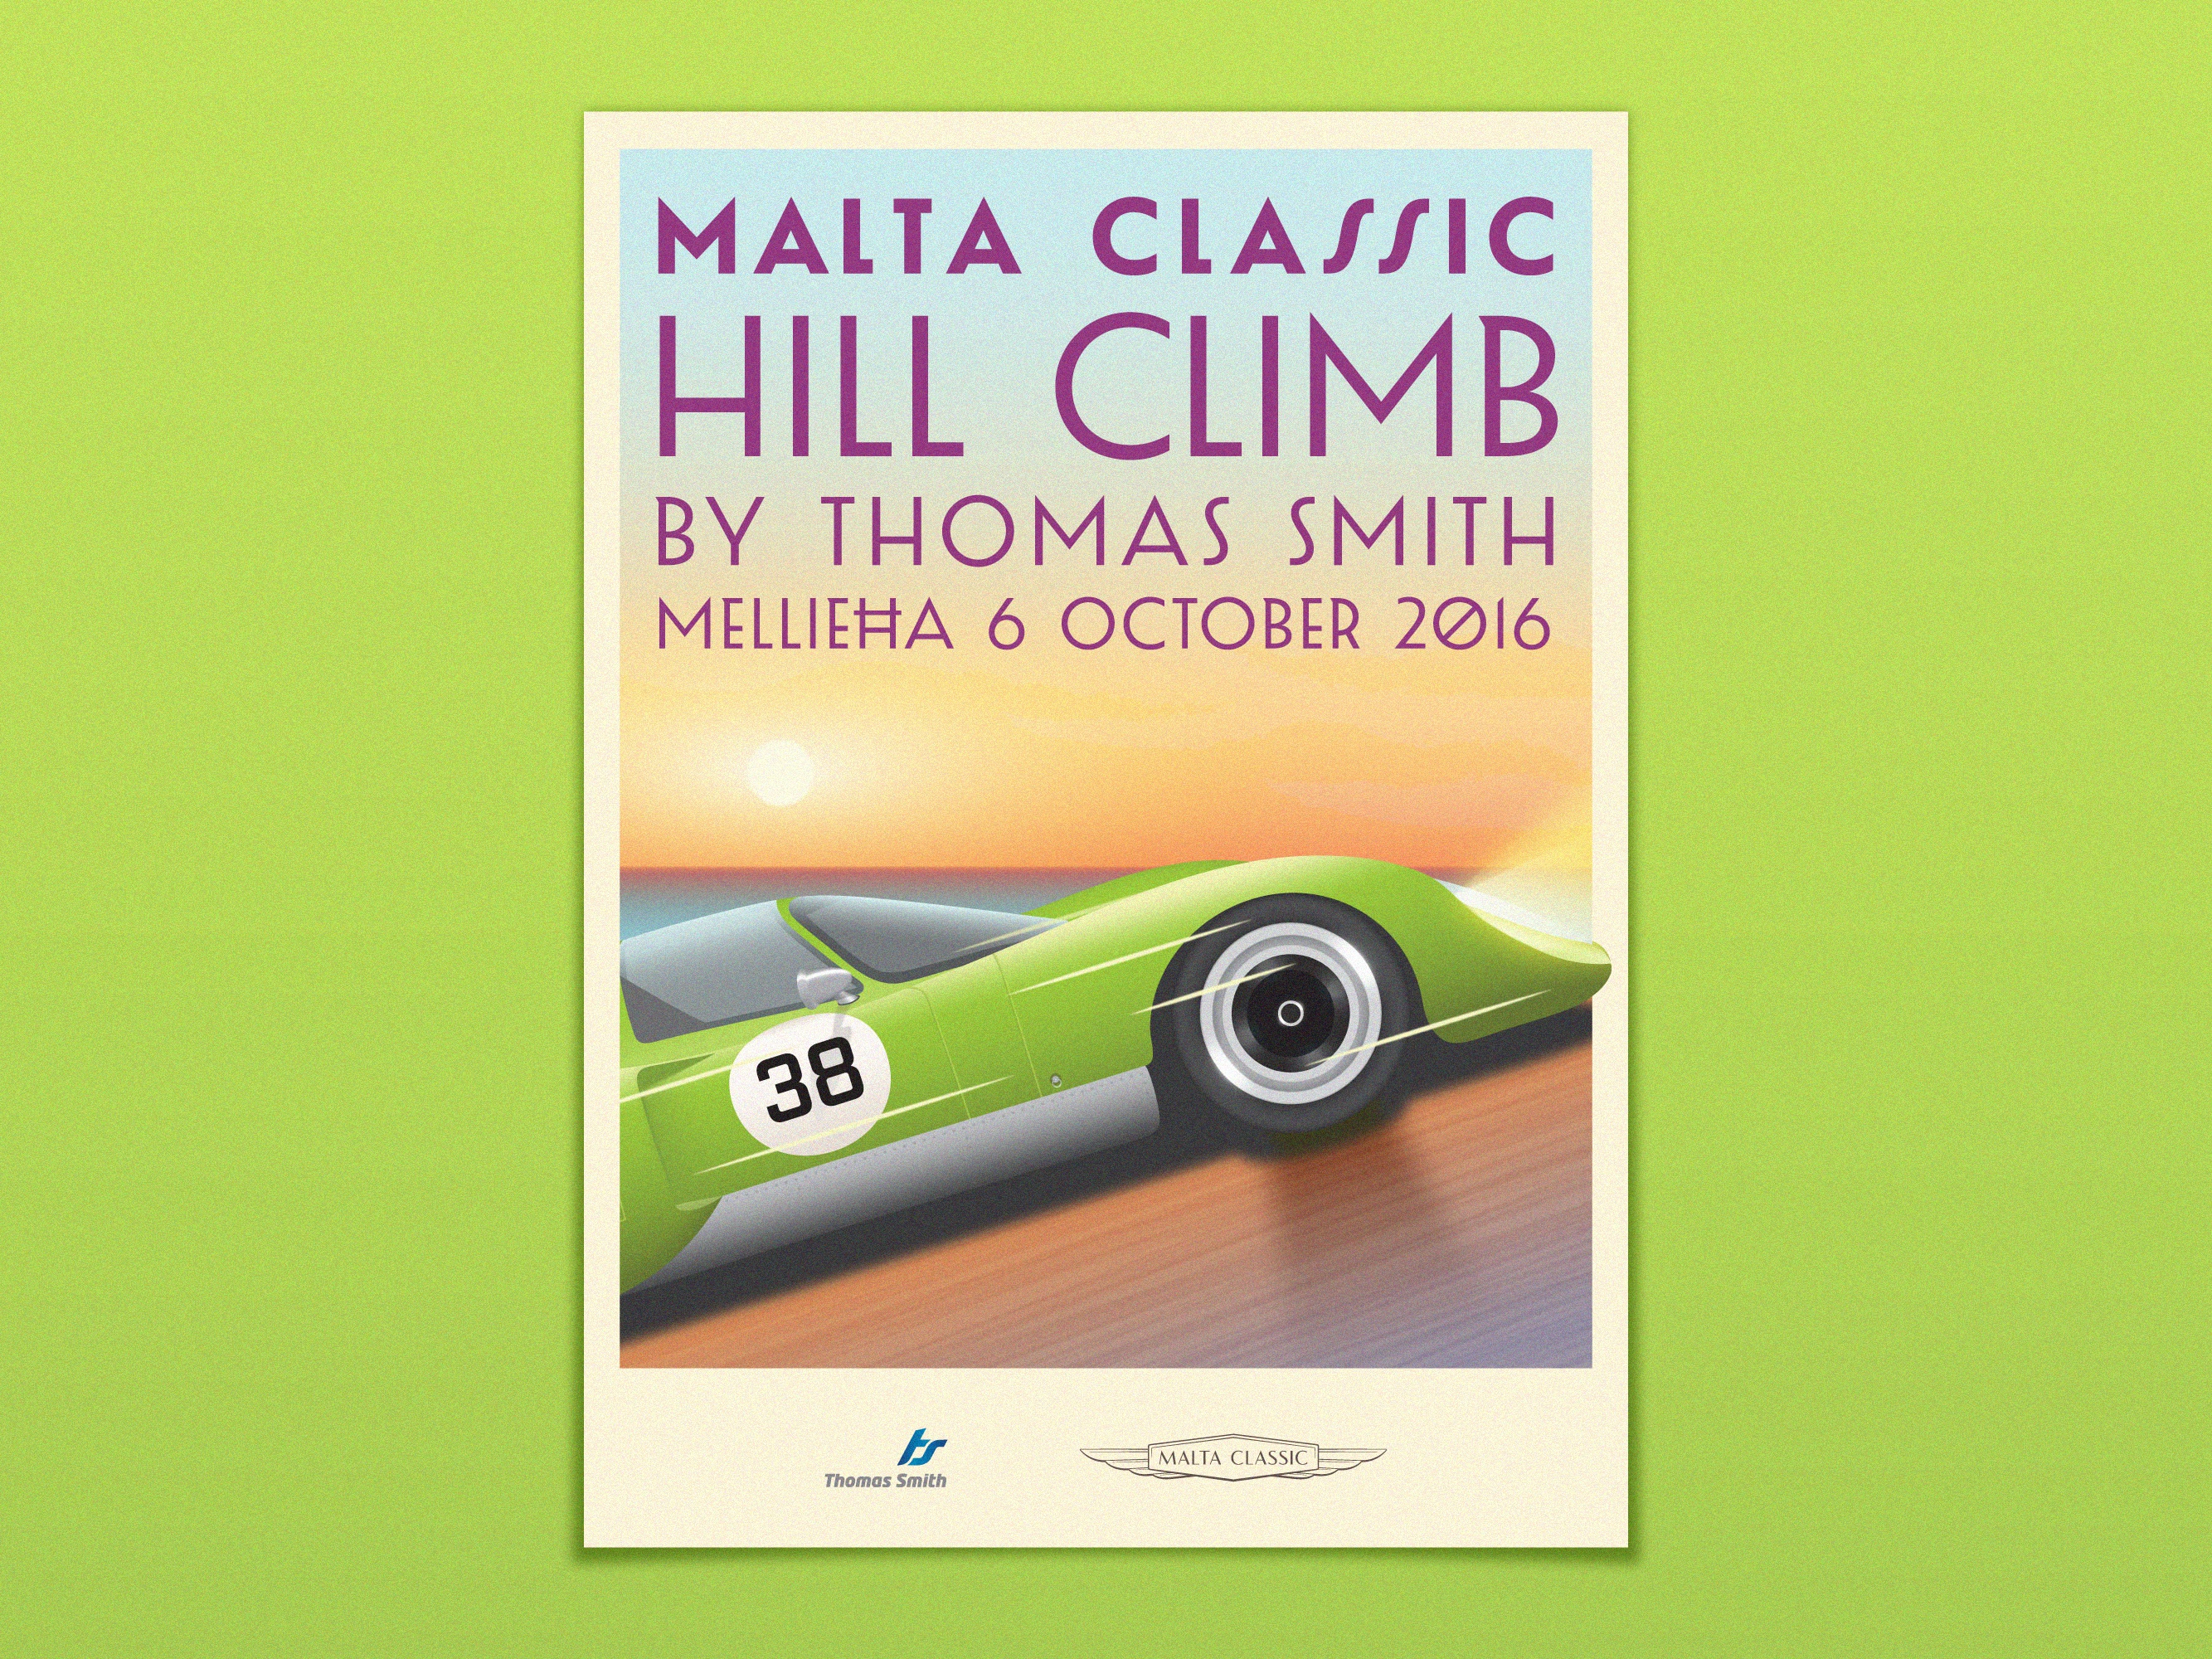 Malta classic 1